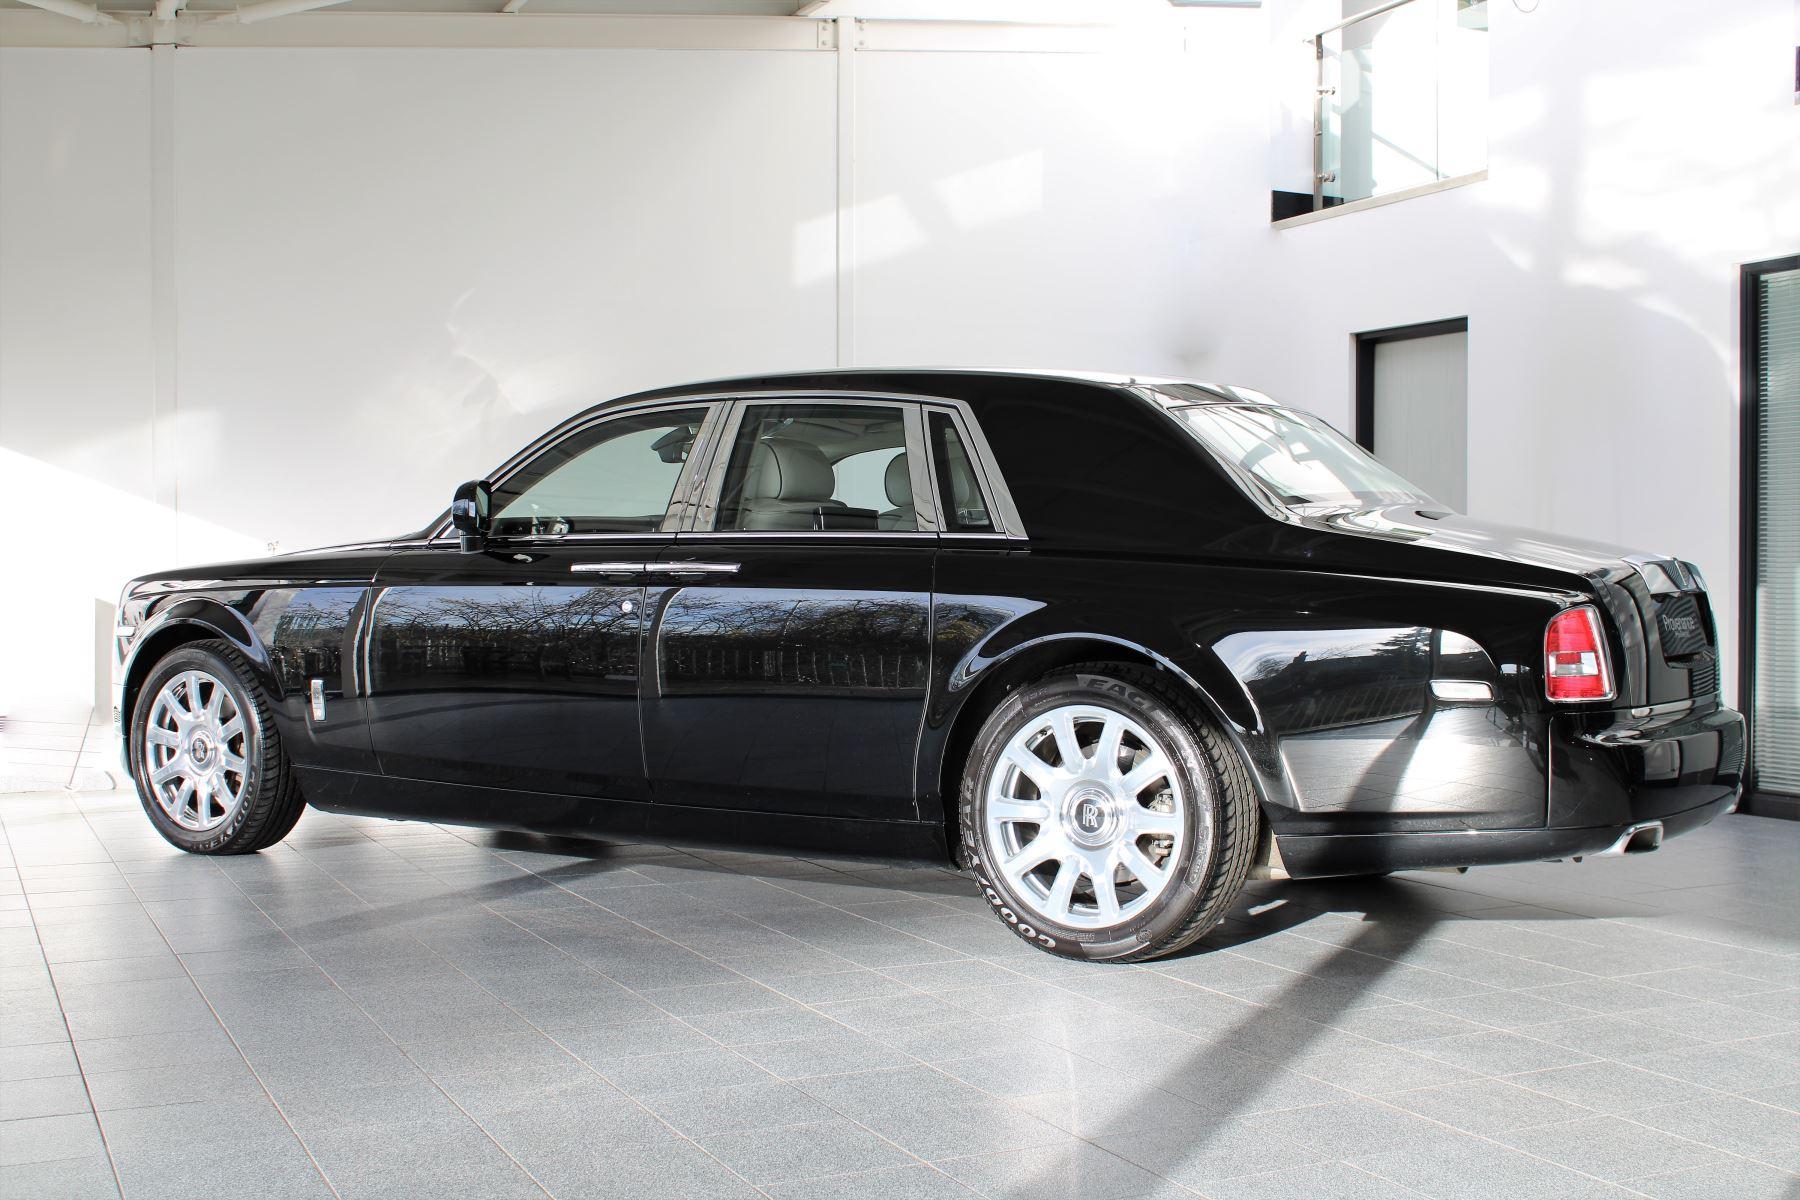 Rolls-Royce Phantom II 4dr Auto image 6